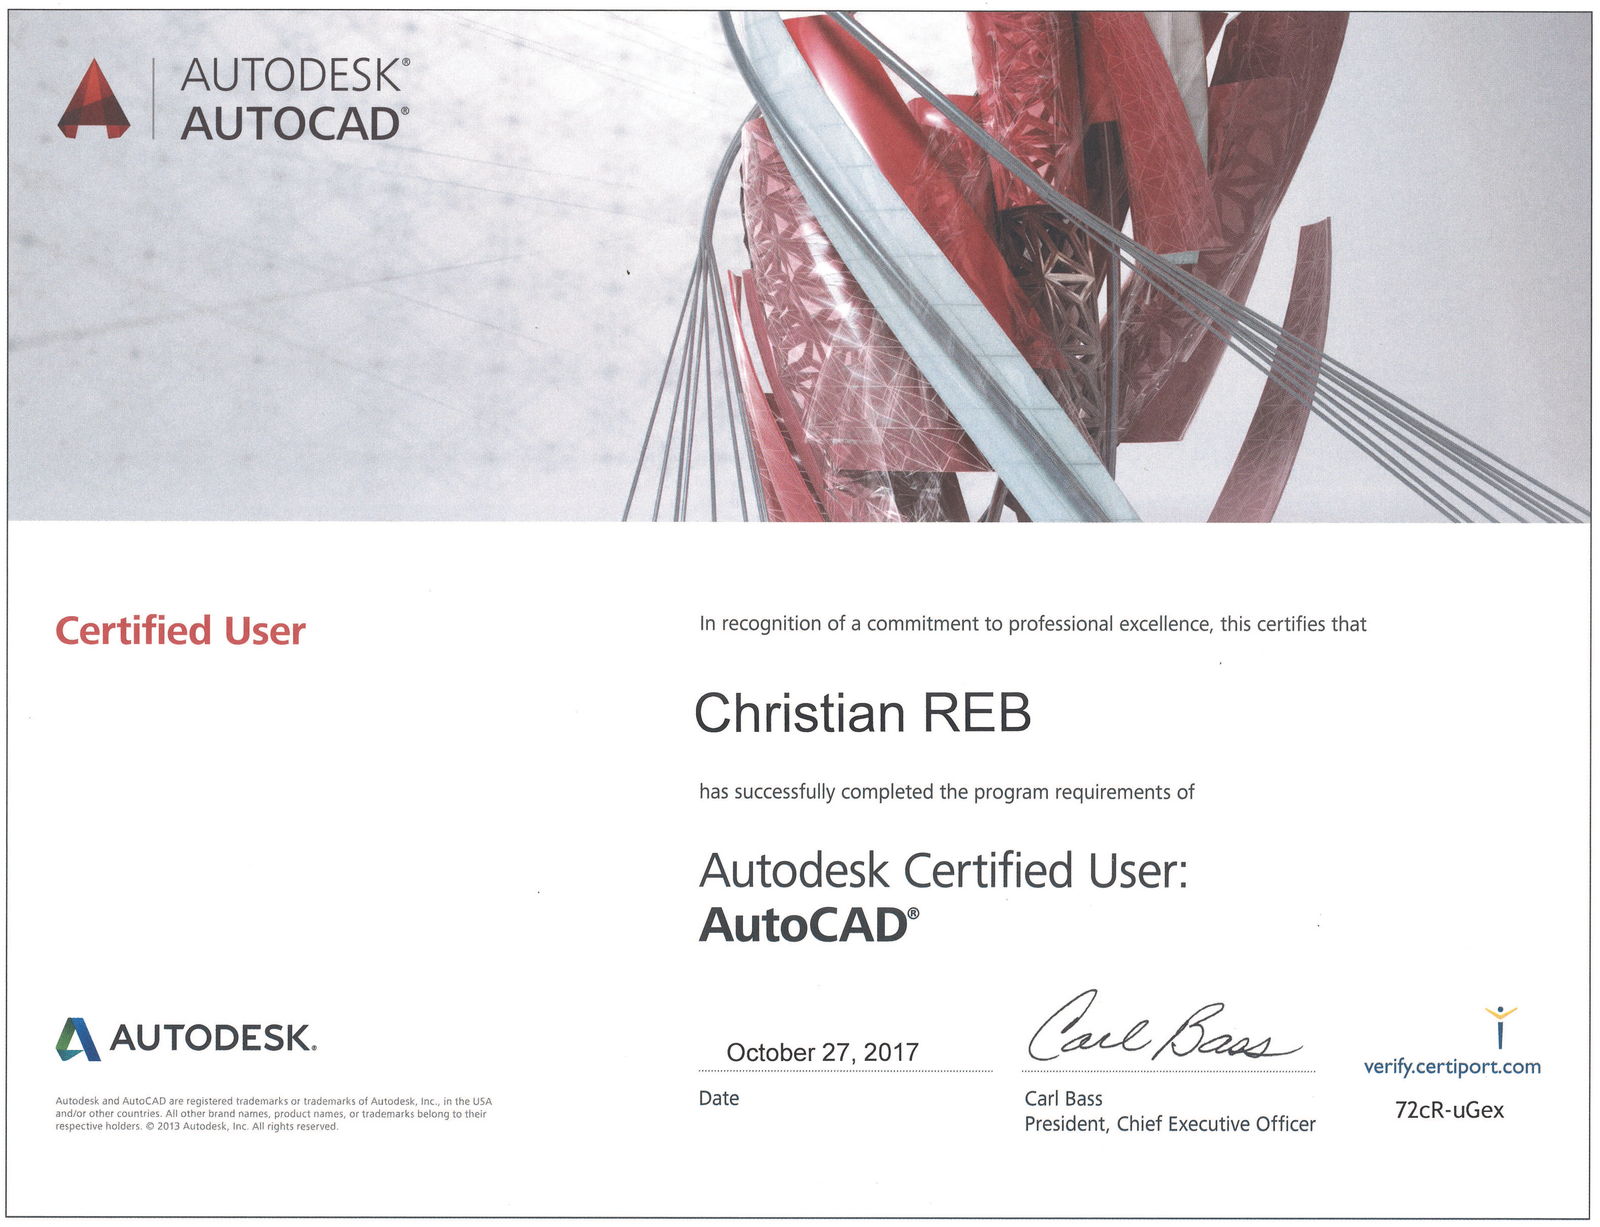 Certification Autodesk Certificat N Dagrment Numro De